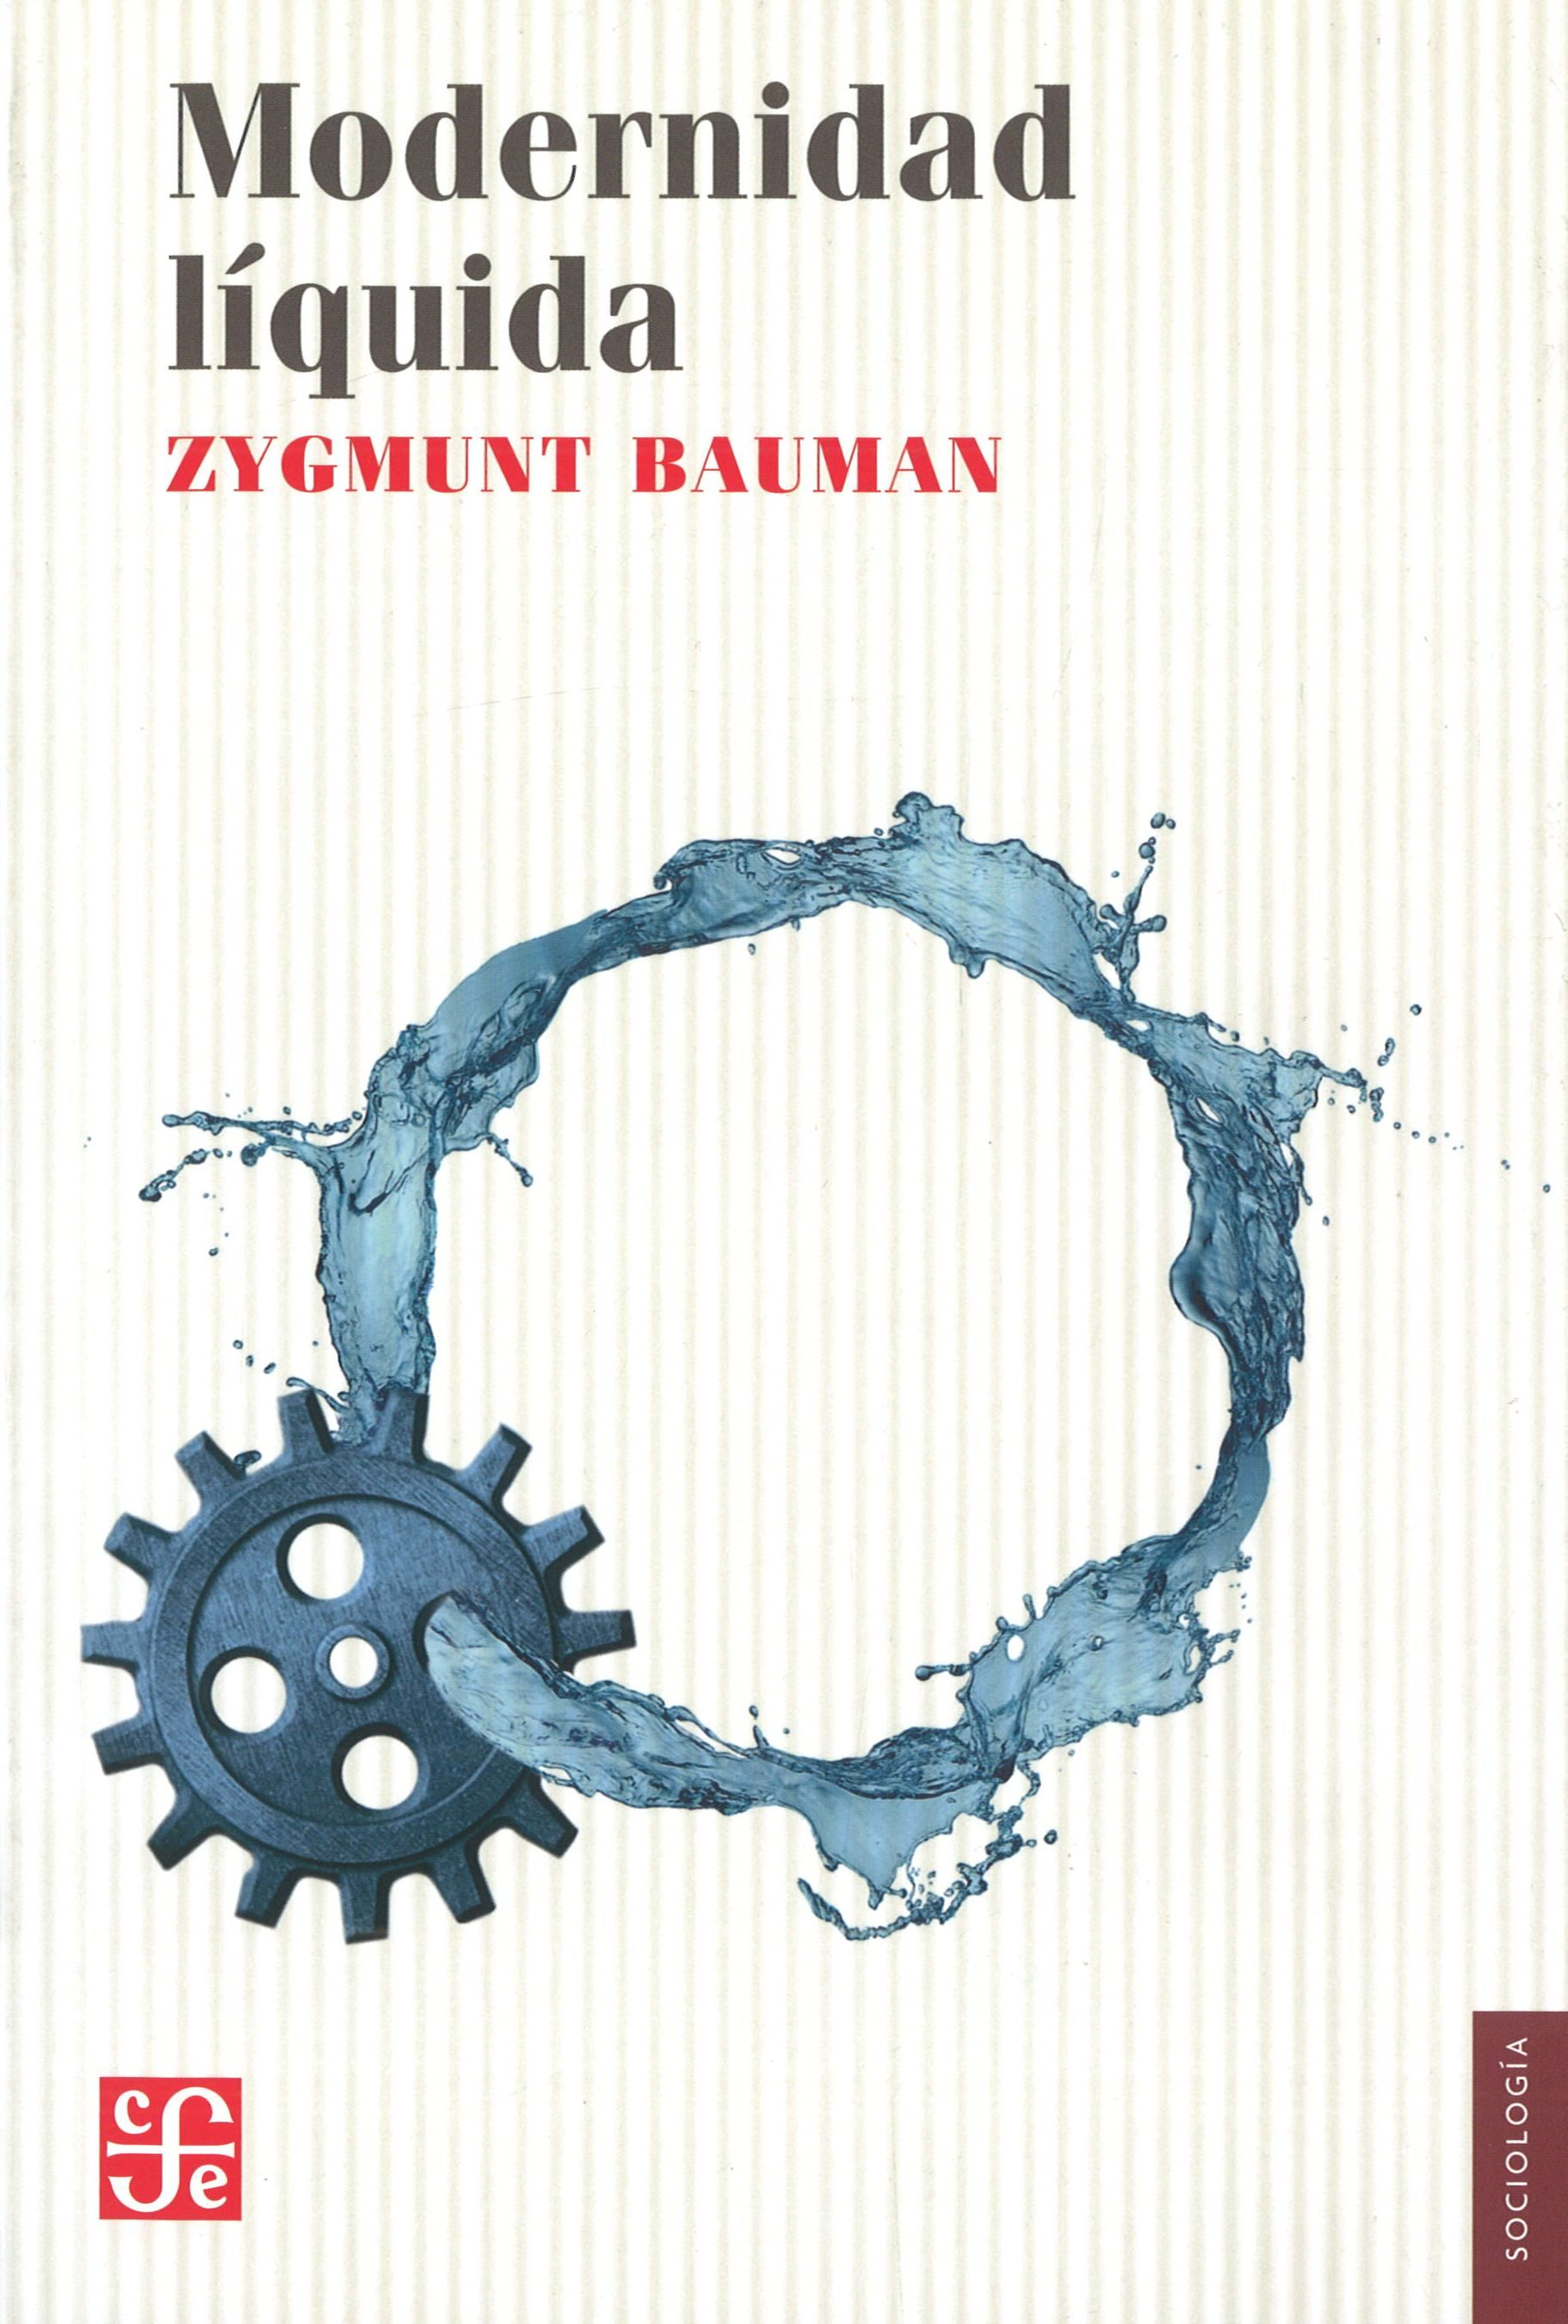 modernidad liquida pdf libro completo